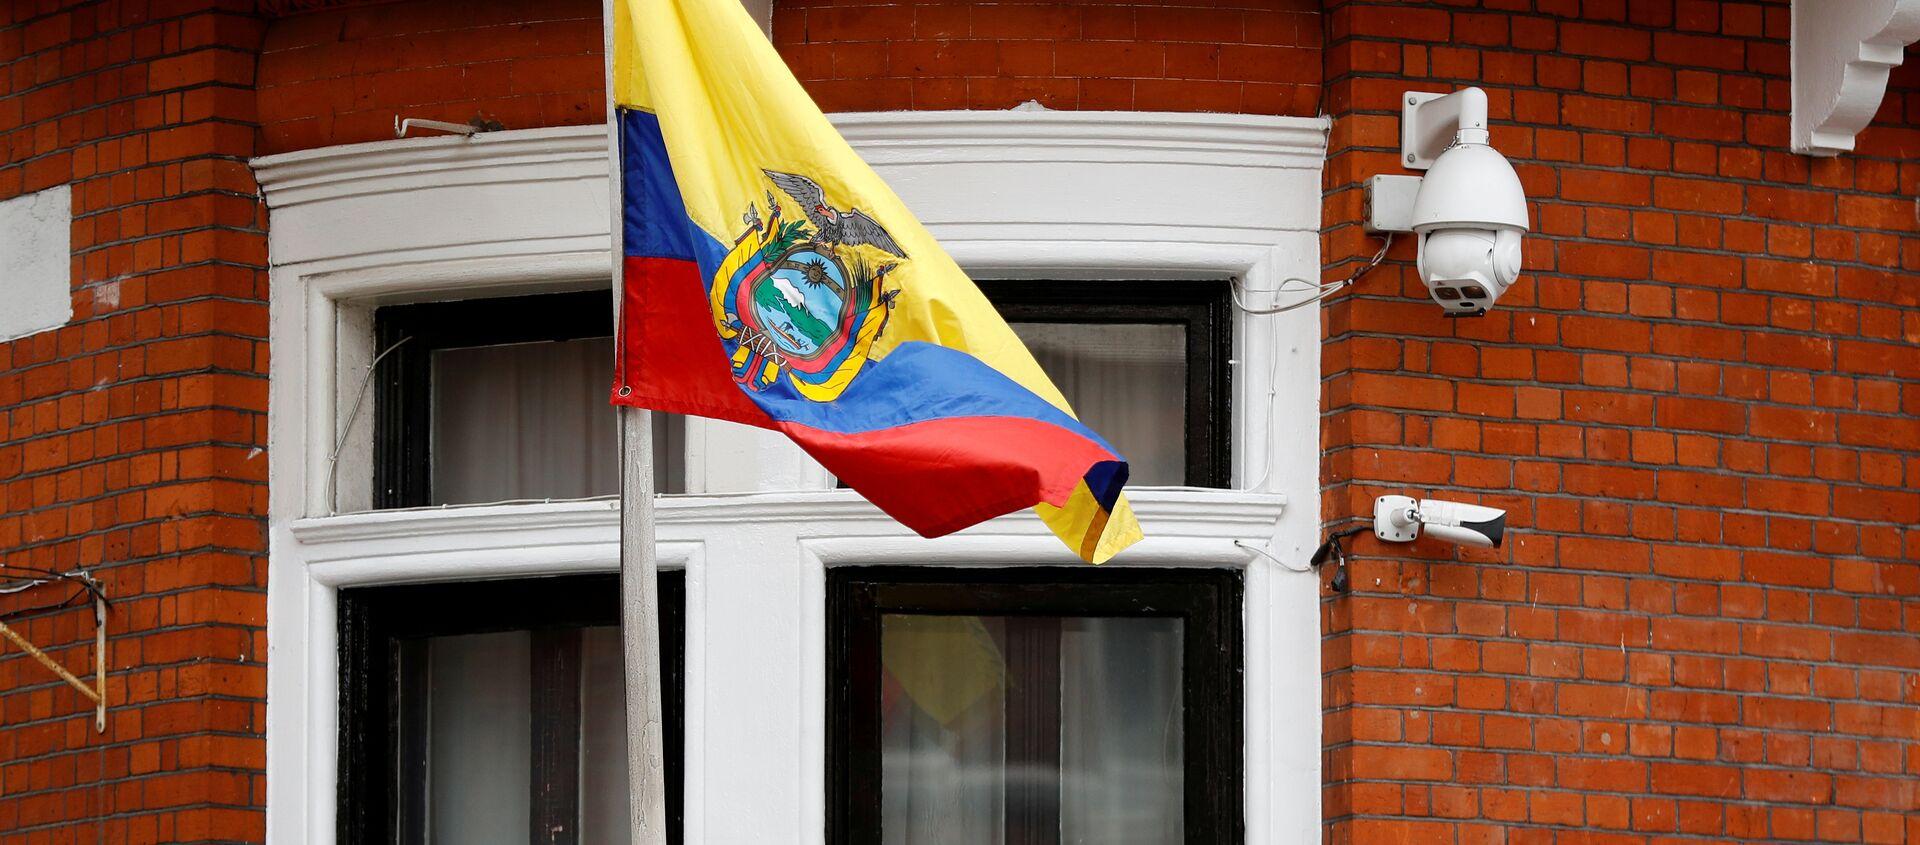 Embajada de Ecuador en Londres - Sputnik Mundo, 1920, 11.04.2019